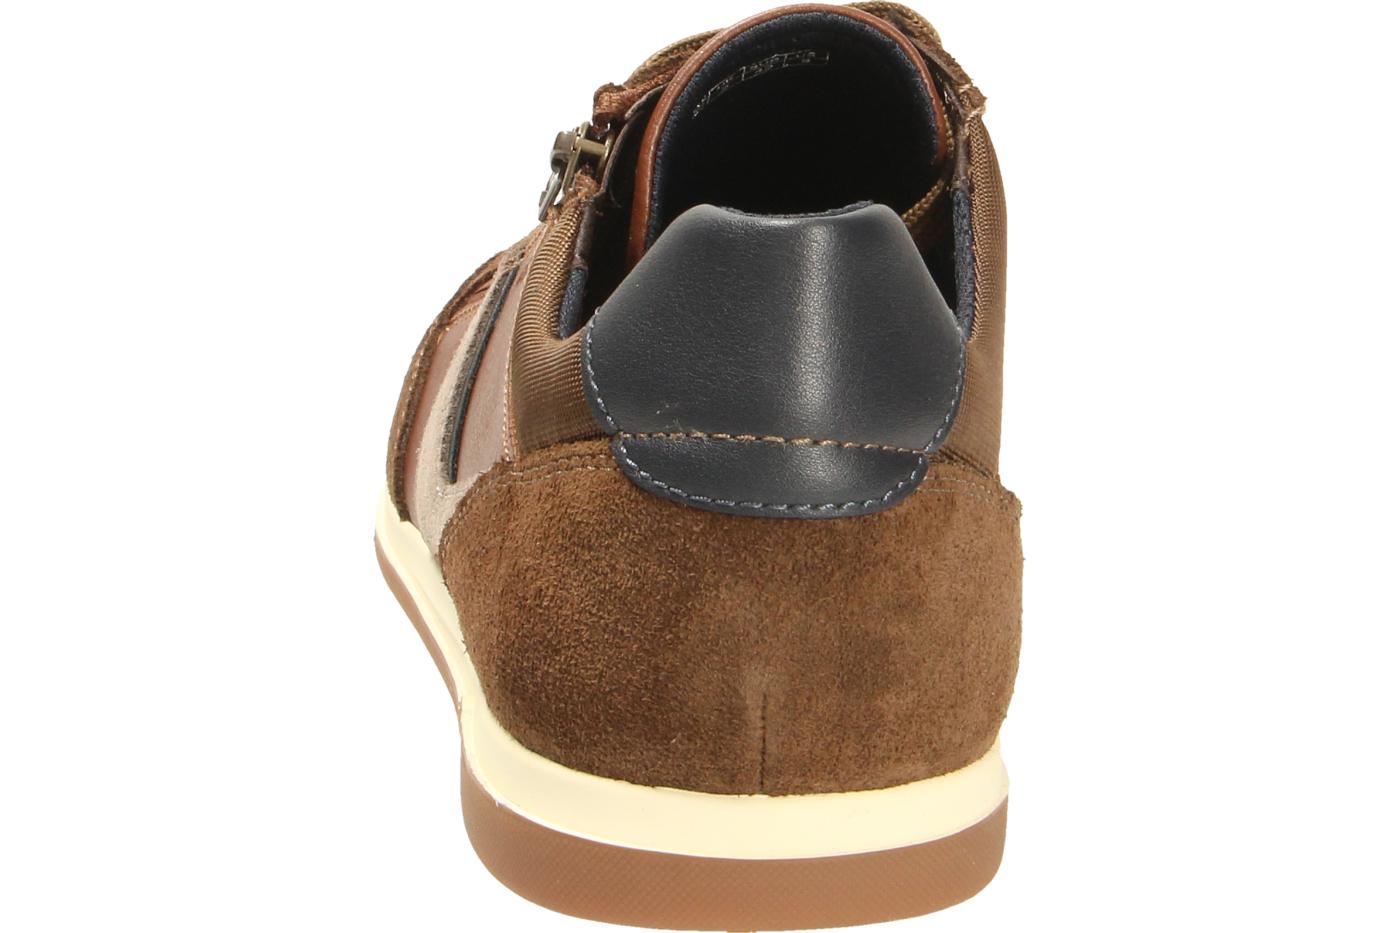 GEOX Sneaker braun U RENAN C SUEDE SYNT.LEA